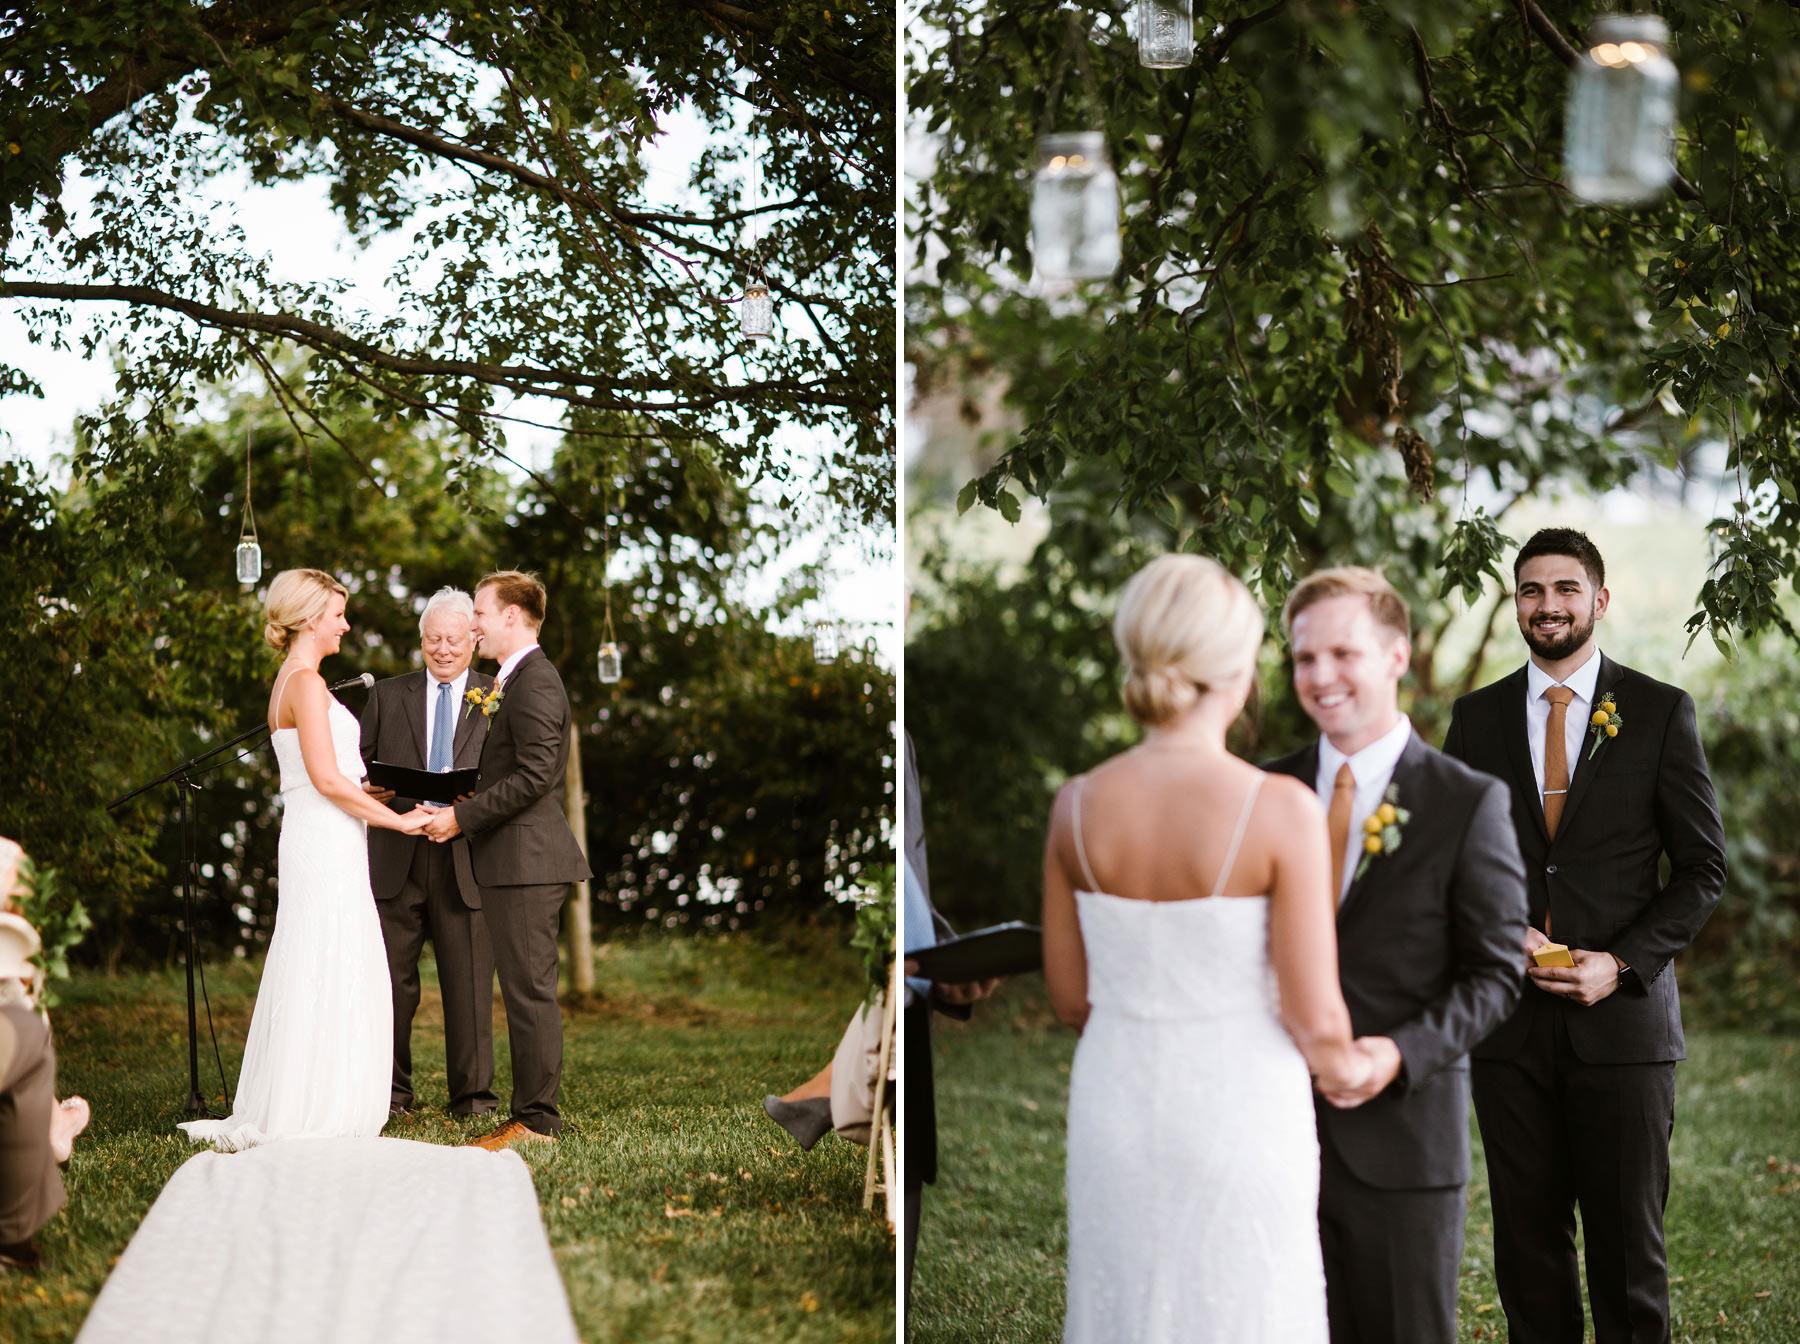 Alldredge Orchard Kansas City_Kindling Wedding Photography BLOG 44.JPG